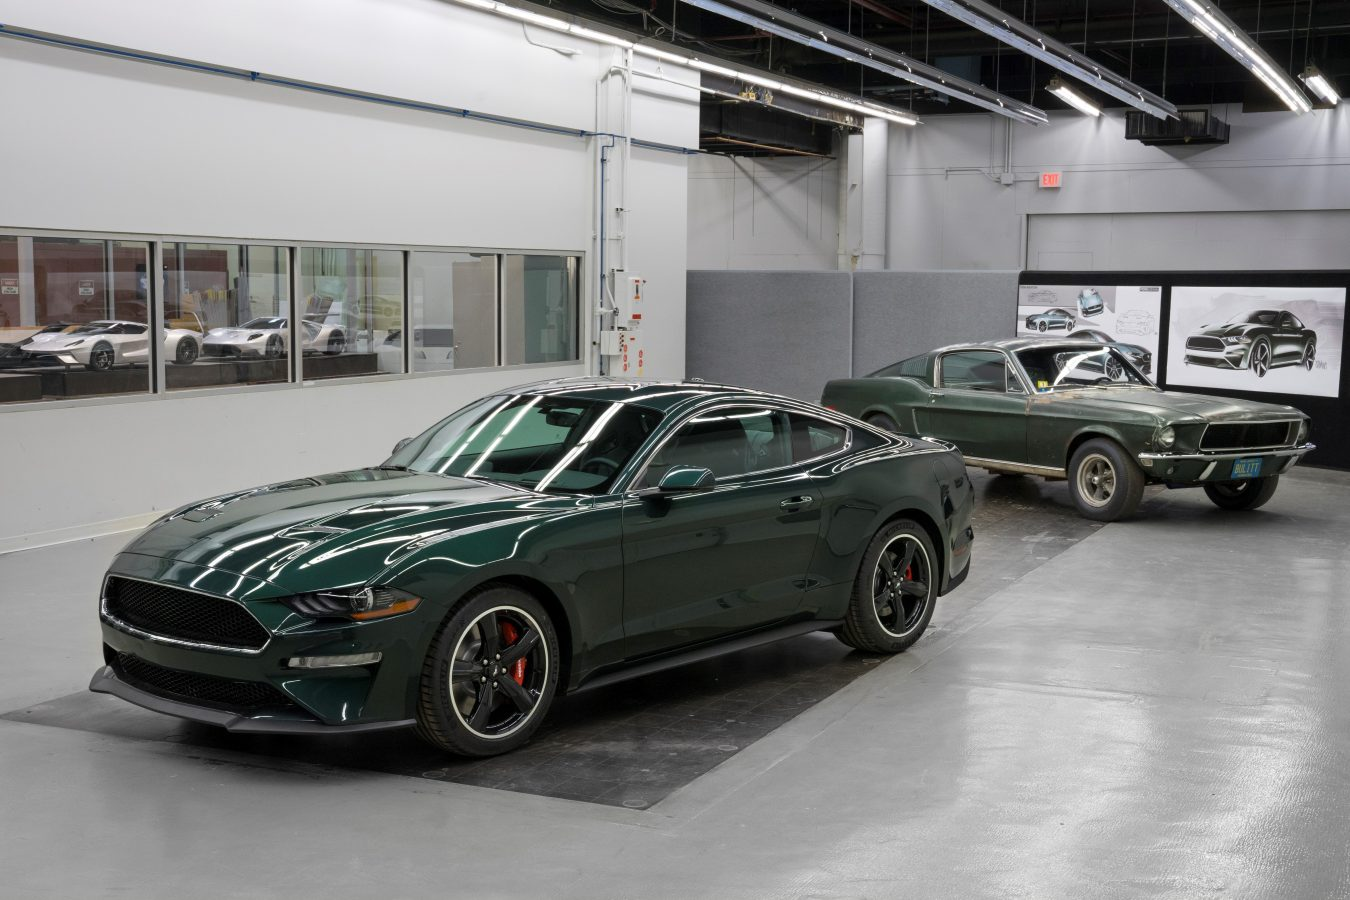 2019 Ford Mustang Bullitt Montecristo